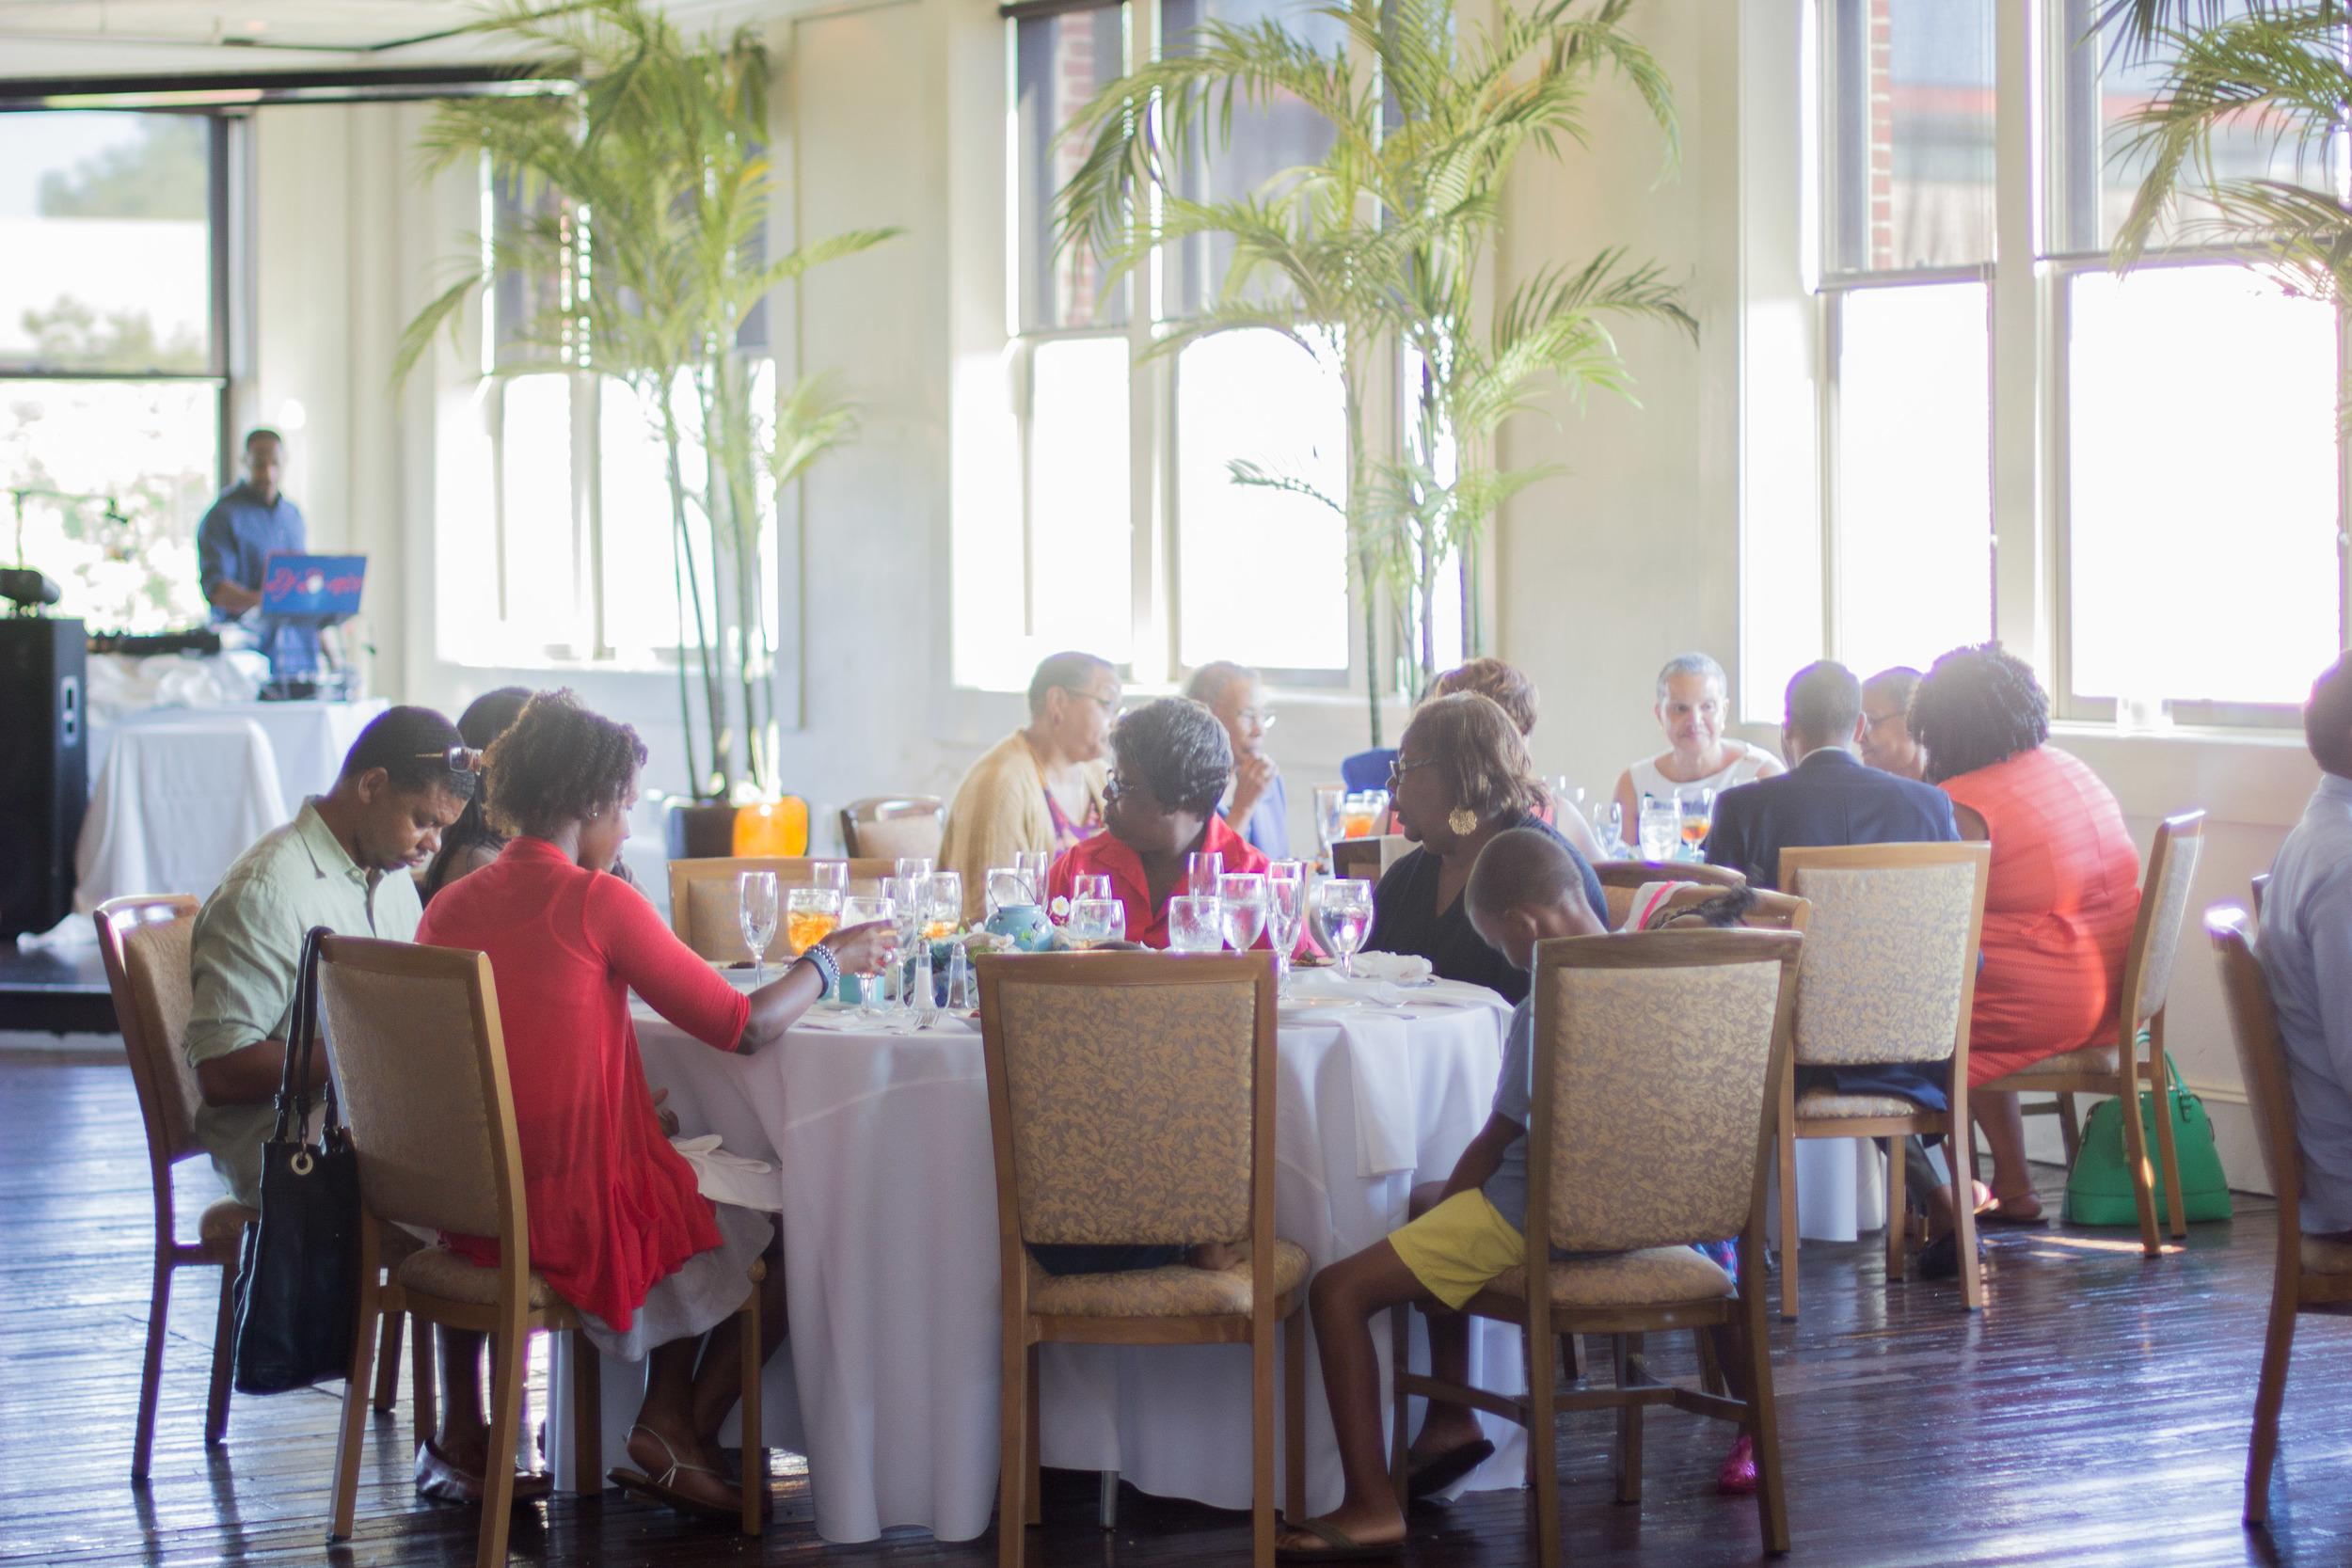 Rustic Aqua Sea Wedding Decor | Martinsborough Wedding Reception - Greenville NC | Bryant Tyson Photography